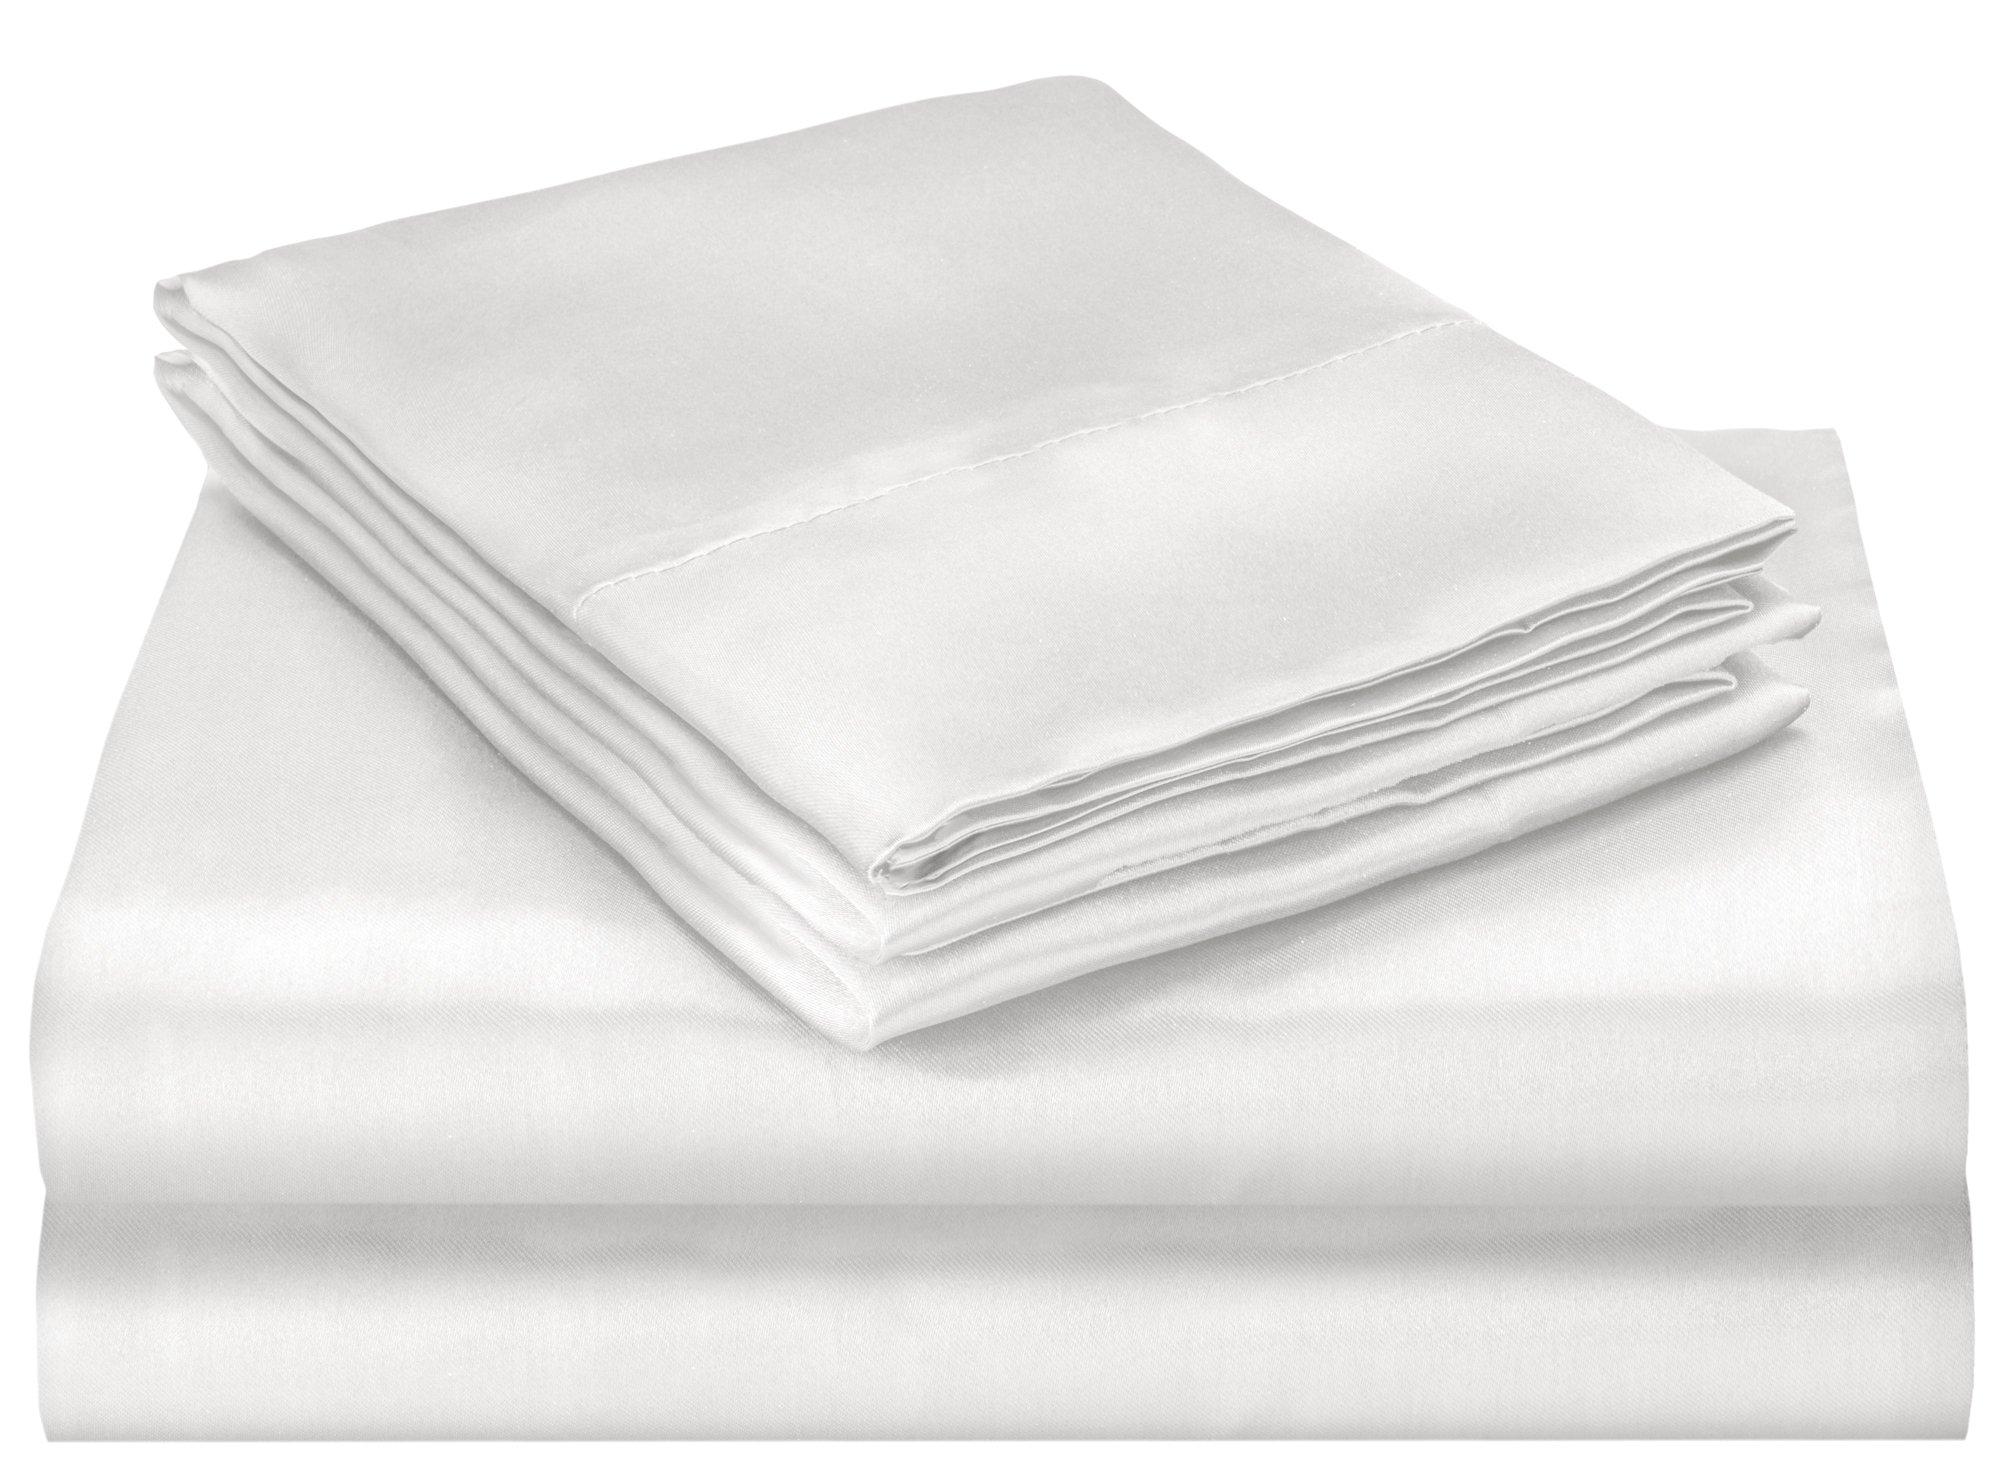 Elaine Karen Soft Silky Satin Queen Bed Sheet Set, White